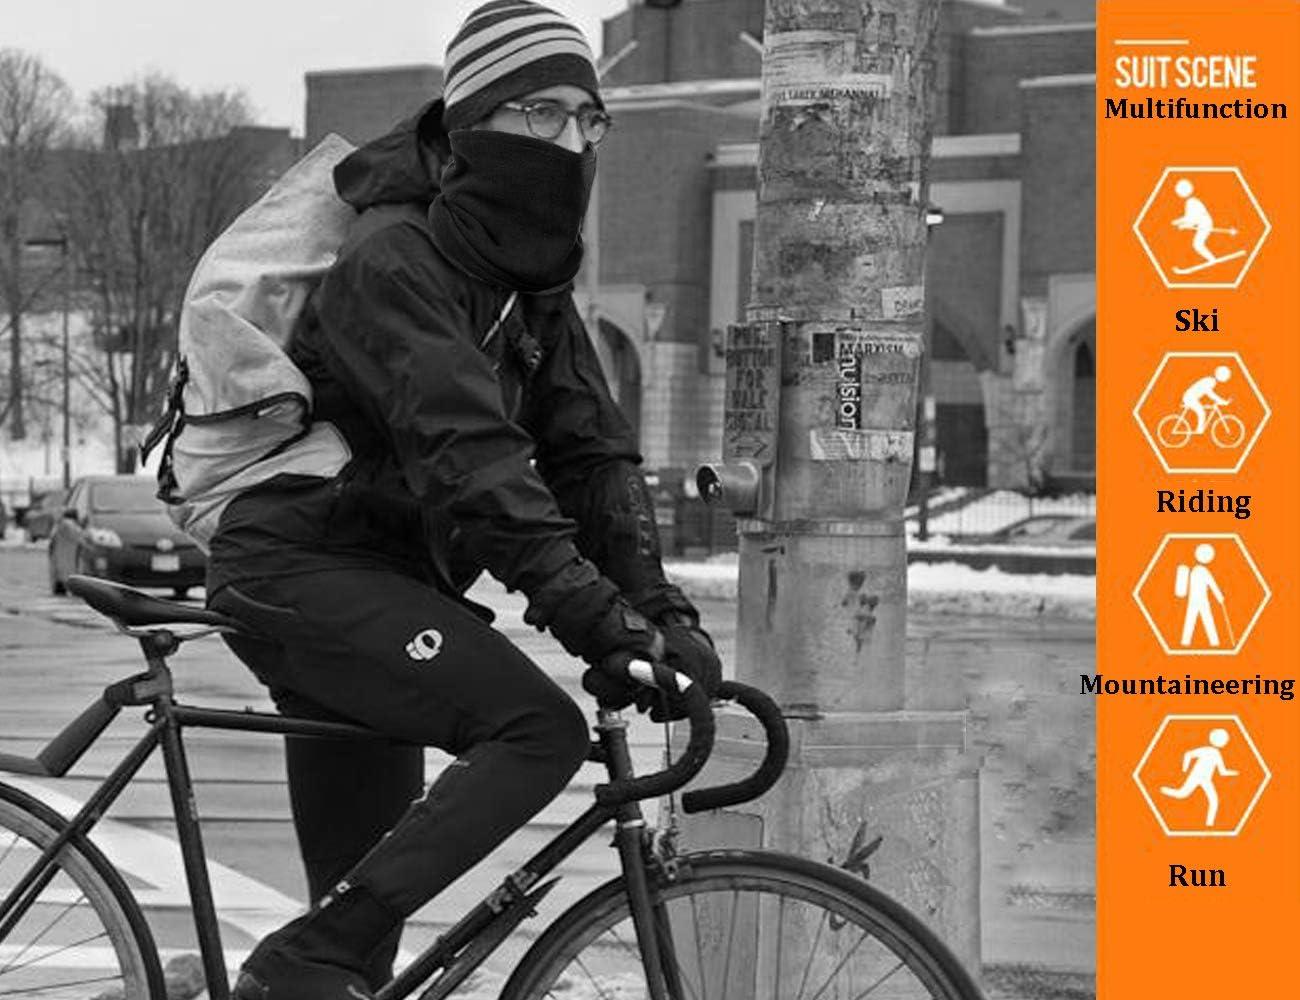 MOLEK Polar Multifunktionstuch Einfarbiger Winter Outdoor Motorrad Fahrrad Schlauchschal Halsw/ärmer Loop Schal mit Kordelzug f/ür M/änner Frauen